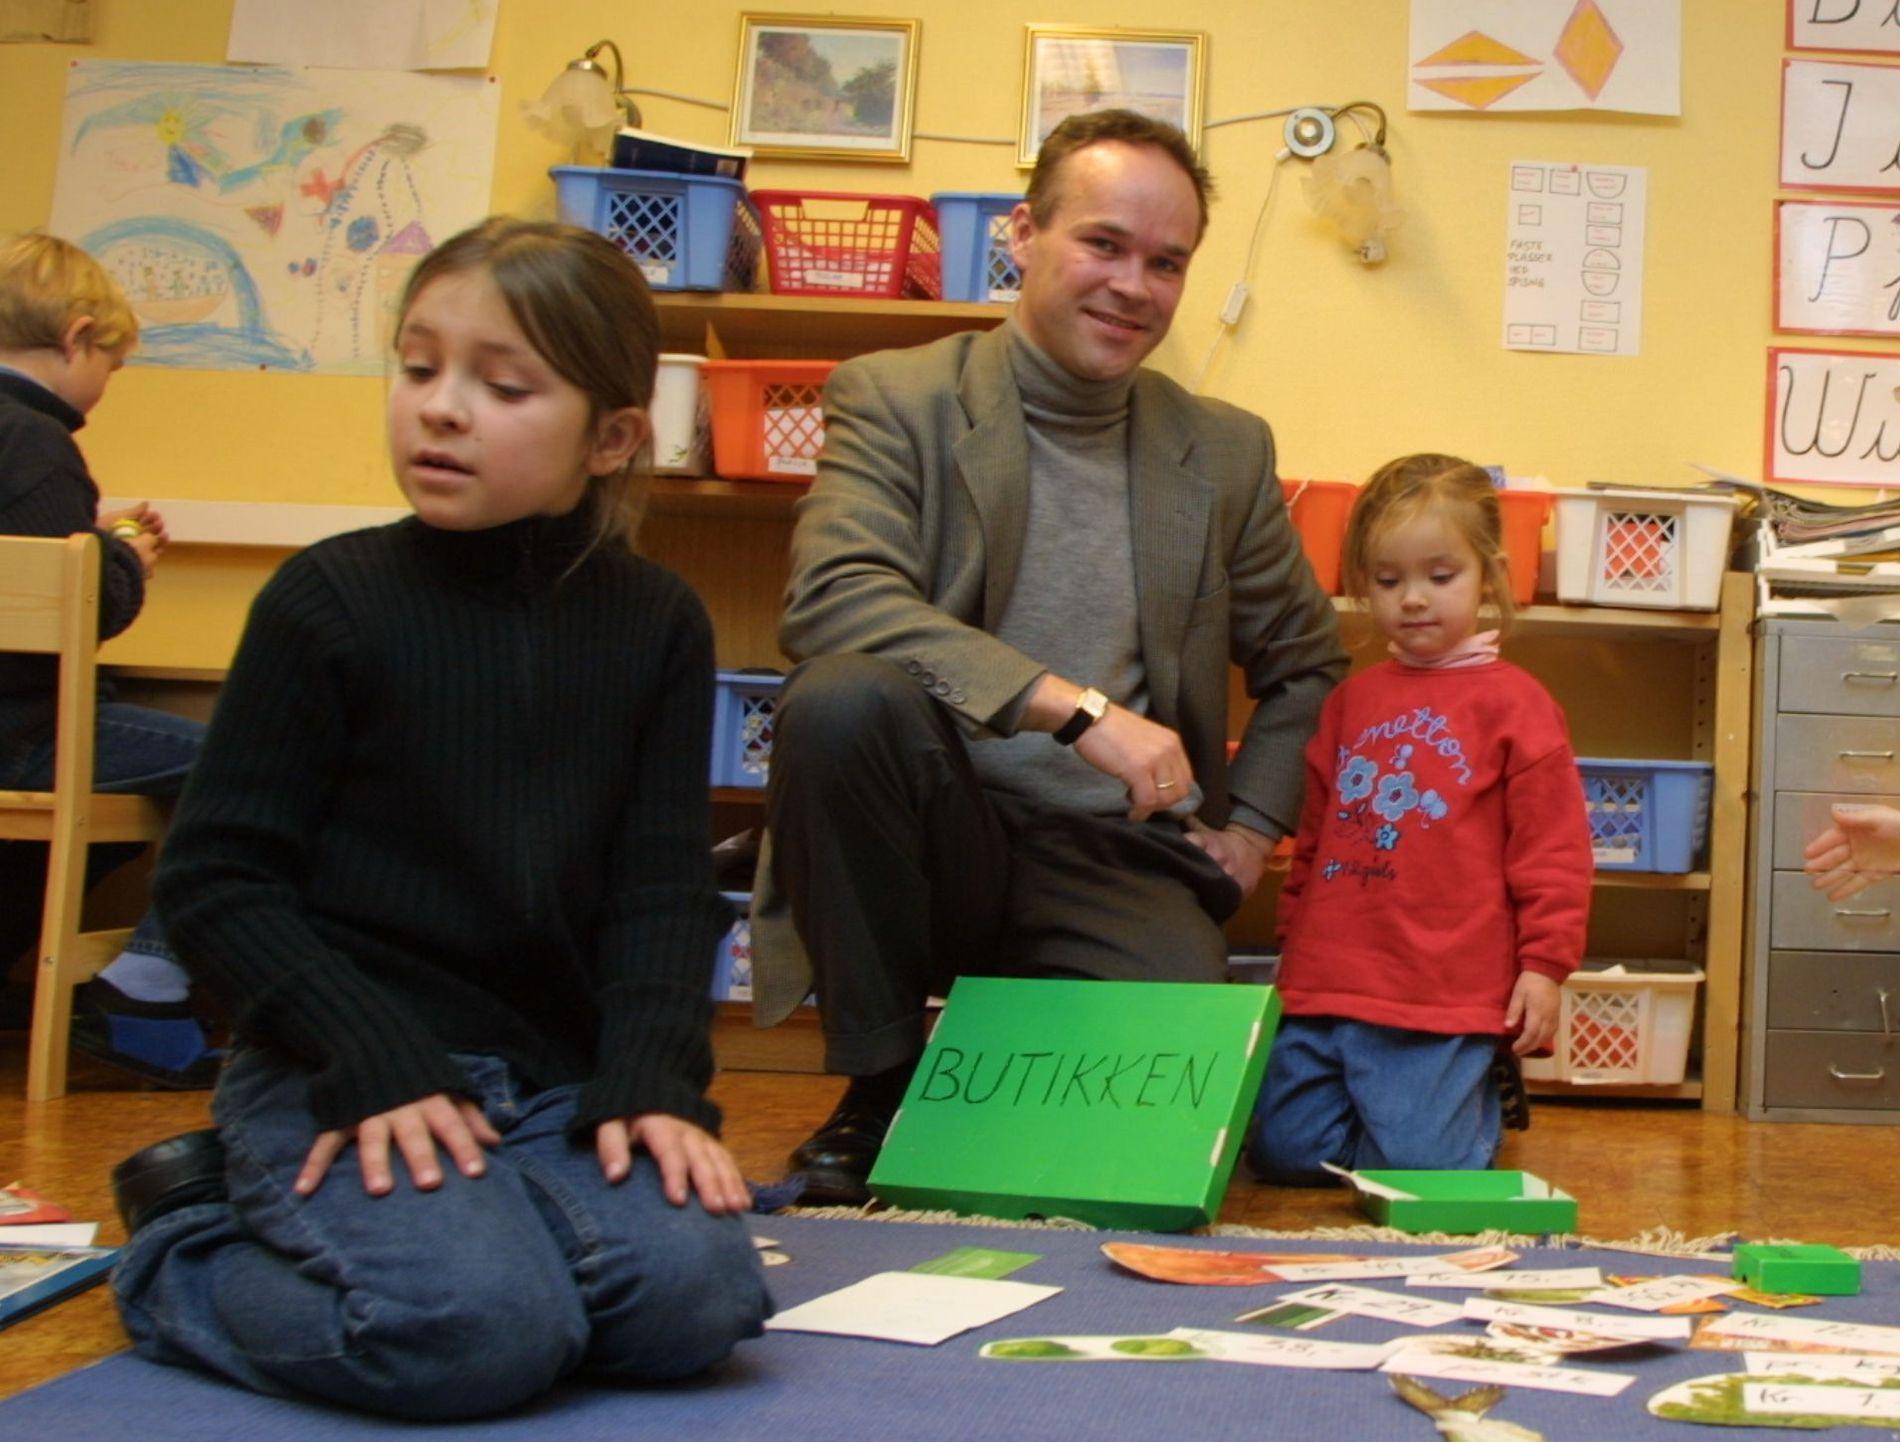 LEKEN PAPPA: Jan Tore Sanner som moderne pappa for 17 år siden med barna Maria og Sigrid i Montessori-skolen på Høvik i Bærum.